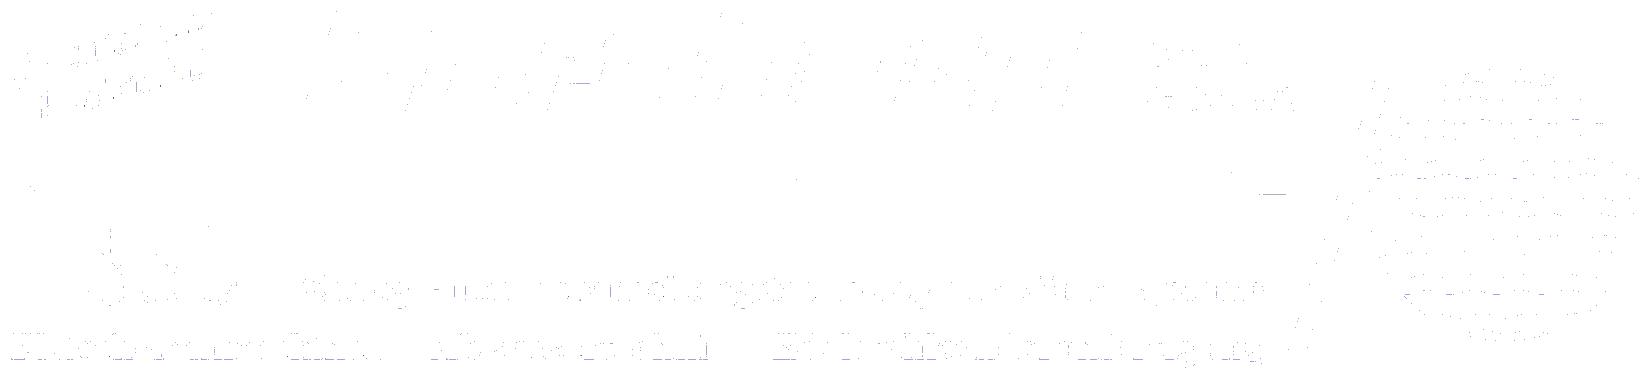 Bornhorn Gmbh & Co KG